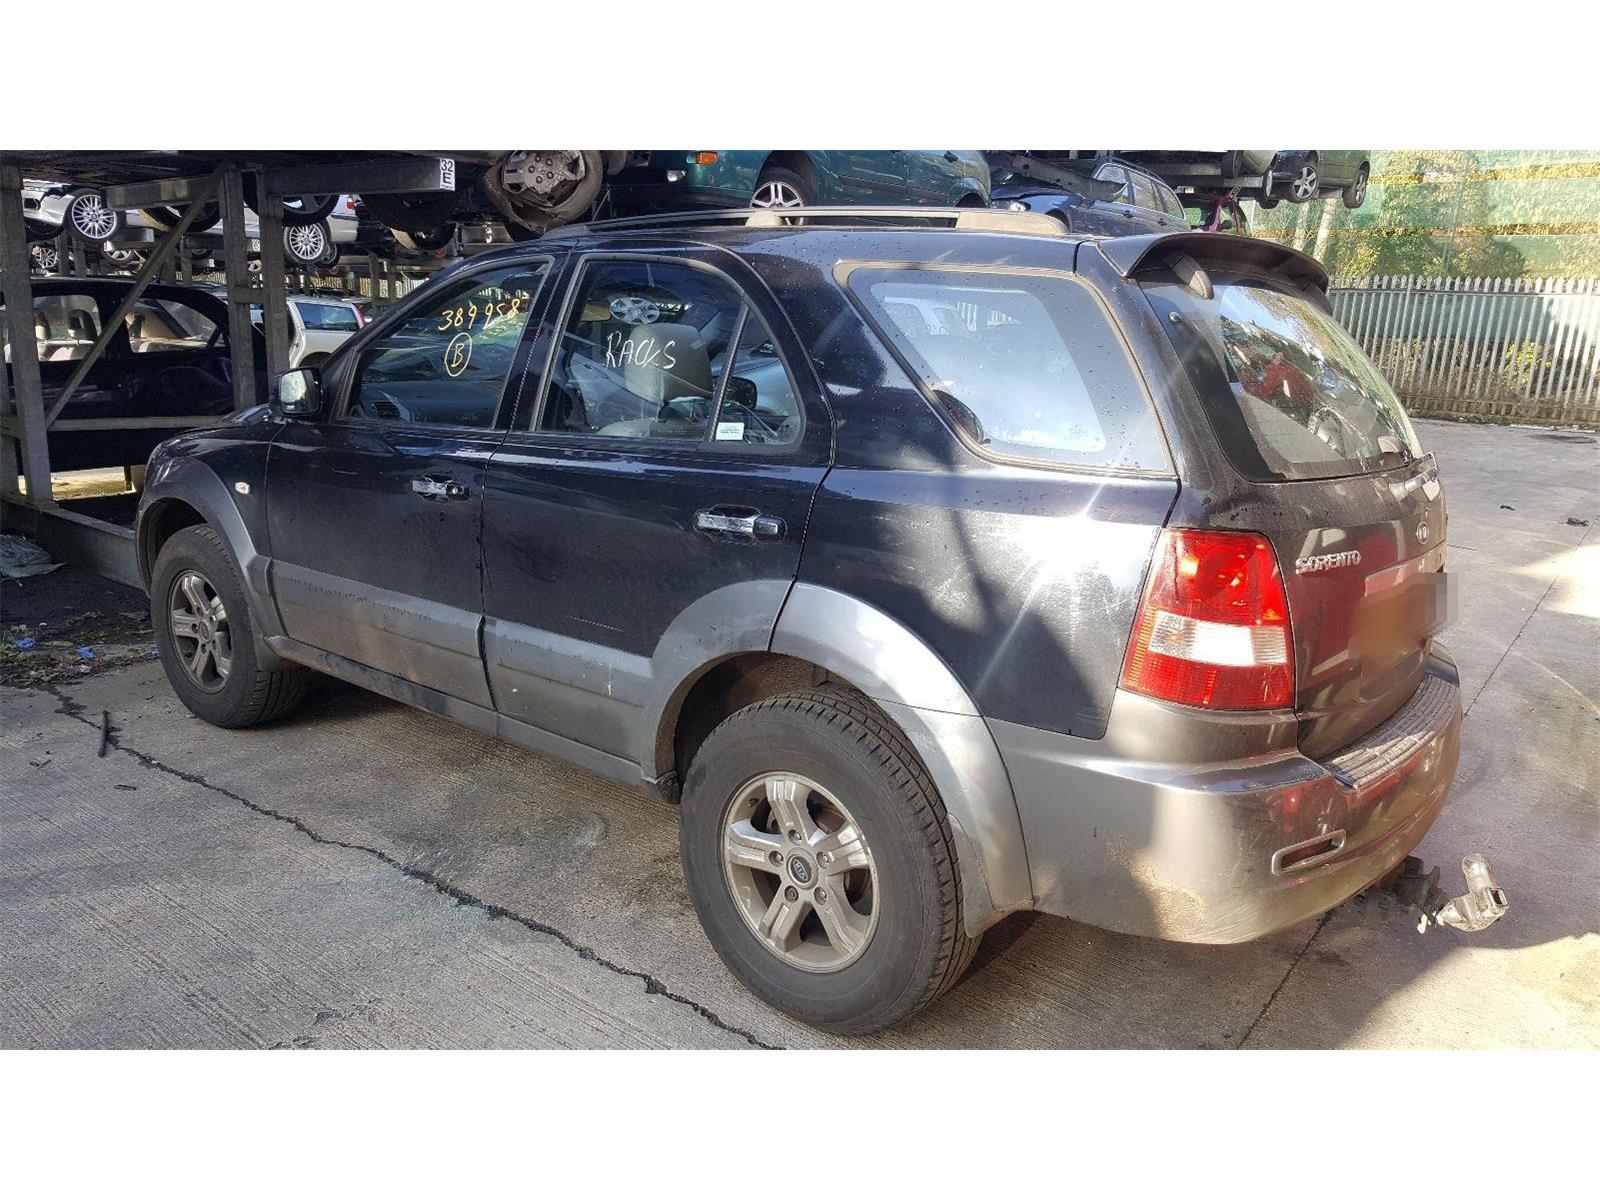 Kia Sorento 2003 To 2006 Xs Crdi 5 Door 4x4 Scrap Salvage Car Venga Fuse Box Location Year